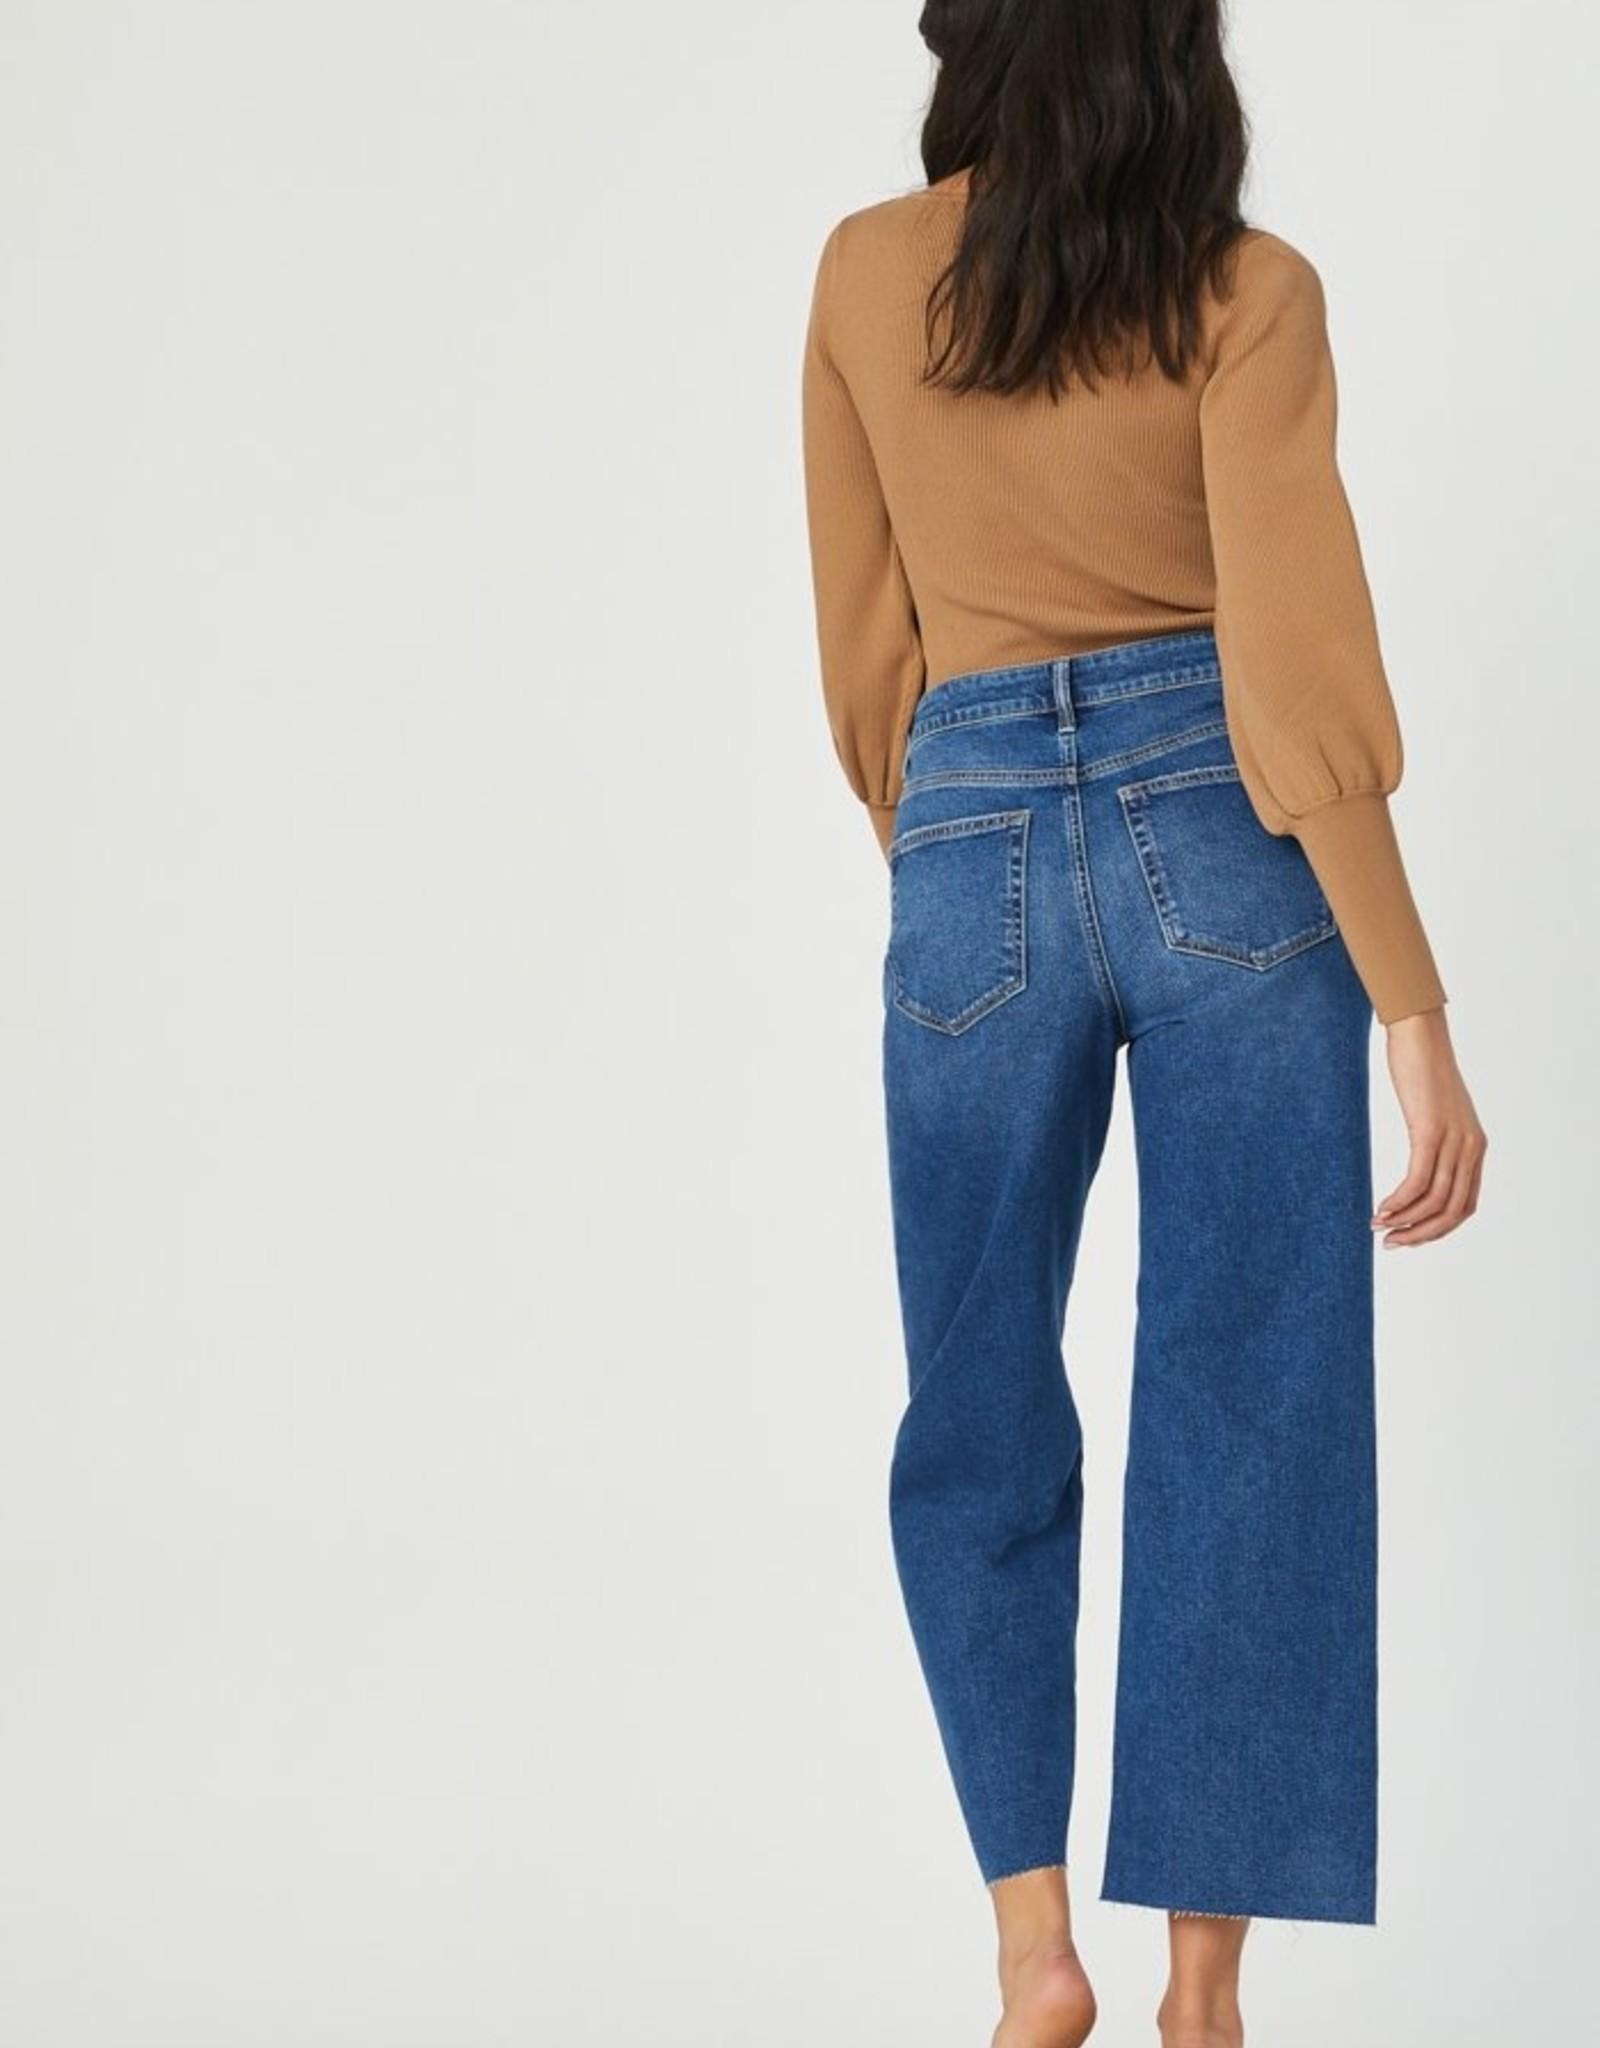 Mavi Bodrum Dark 90's Jeans